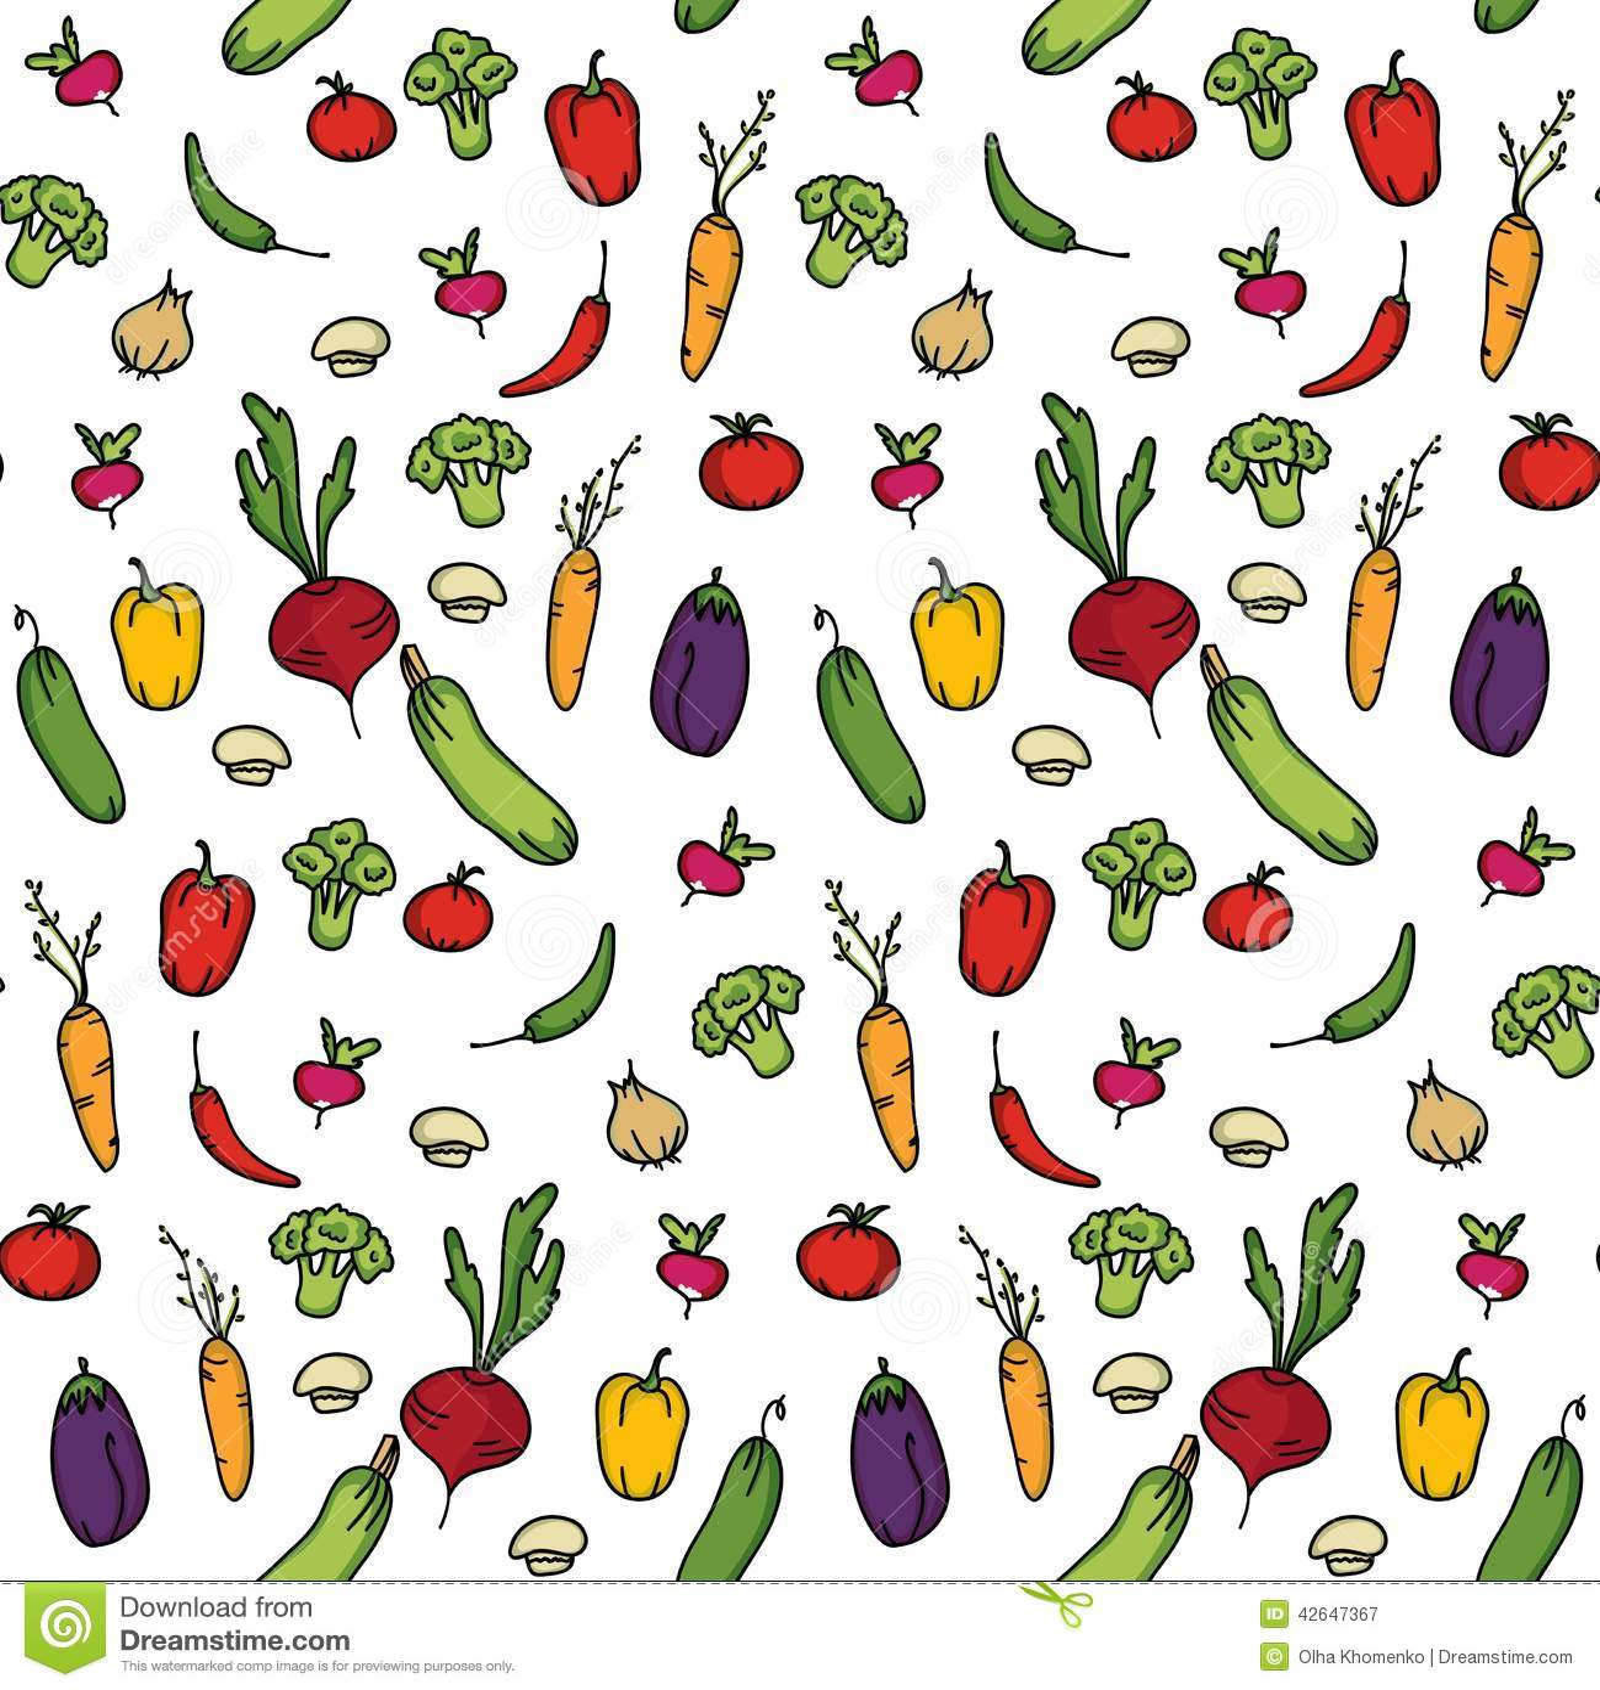 framed prints for kitchens kitchen trash can ideas 菜无缝的厨房背景向量例证 插画包括有健康 brochette 蘑菇 自治权 菜无缝的厨房背景